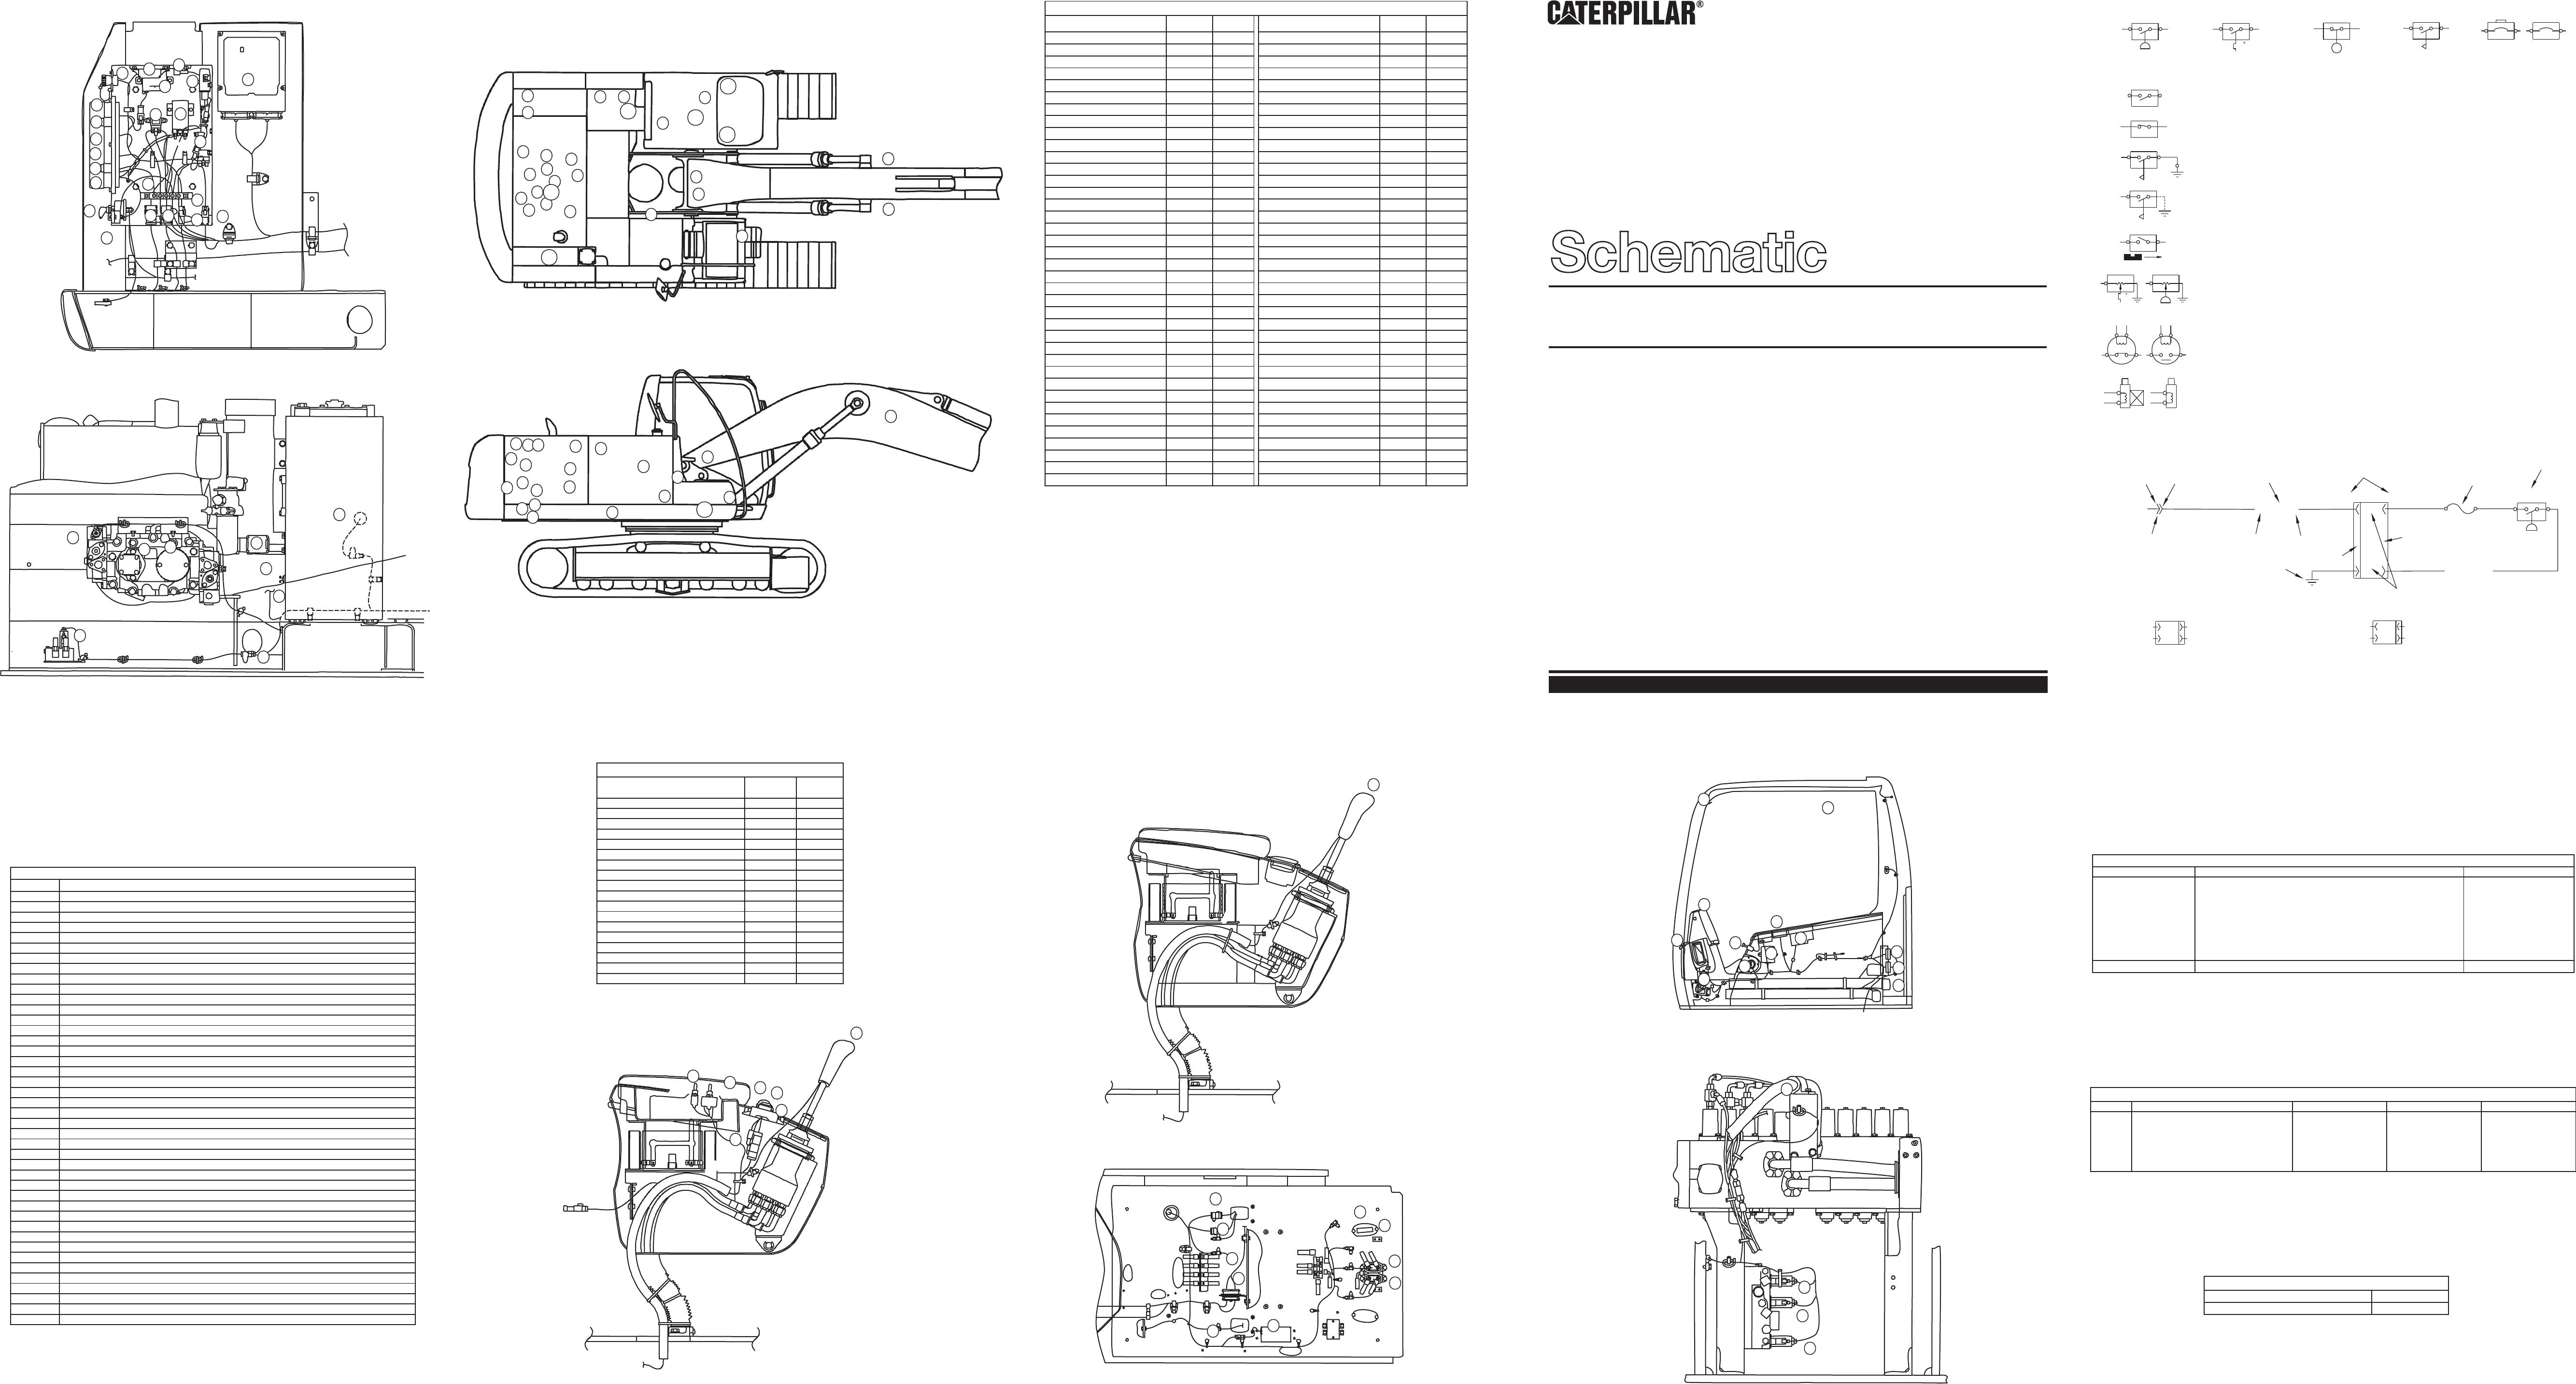 320c Excavator Electrical System